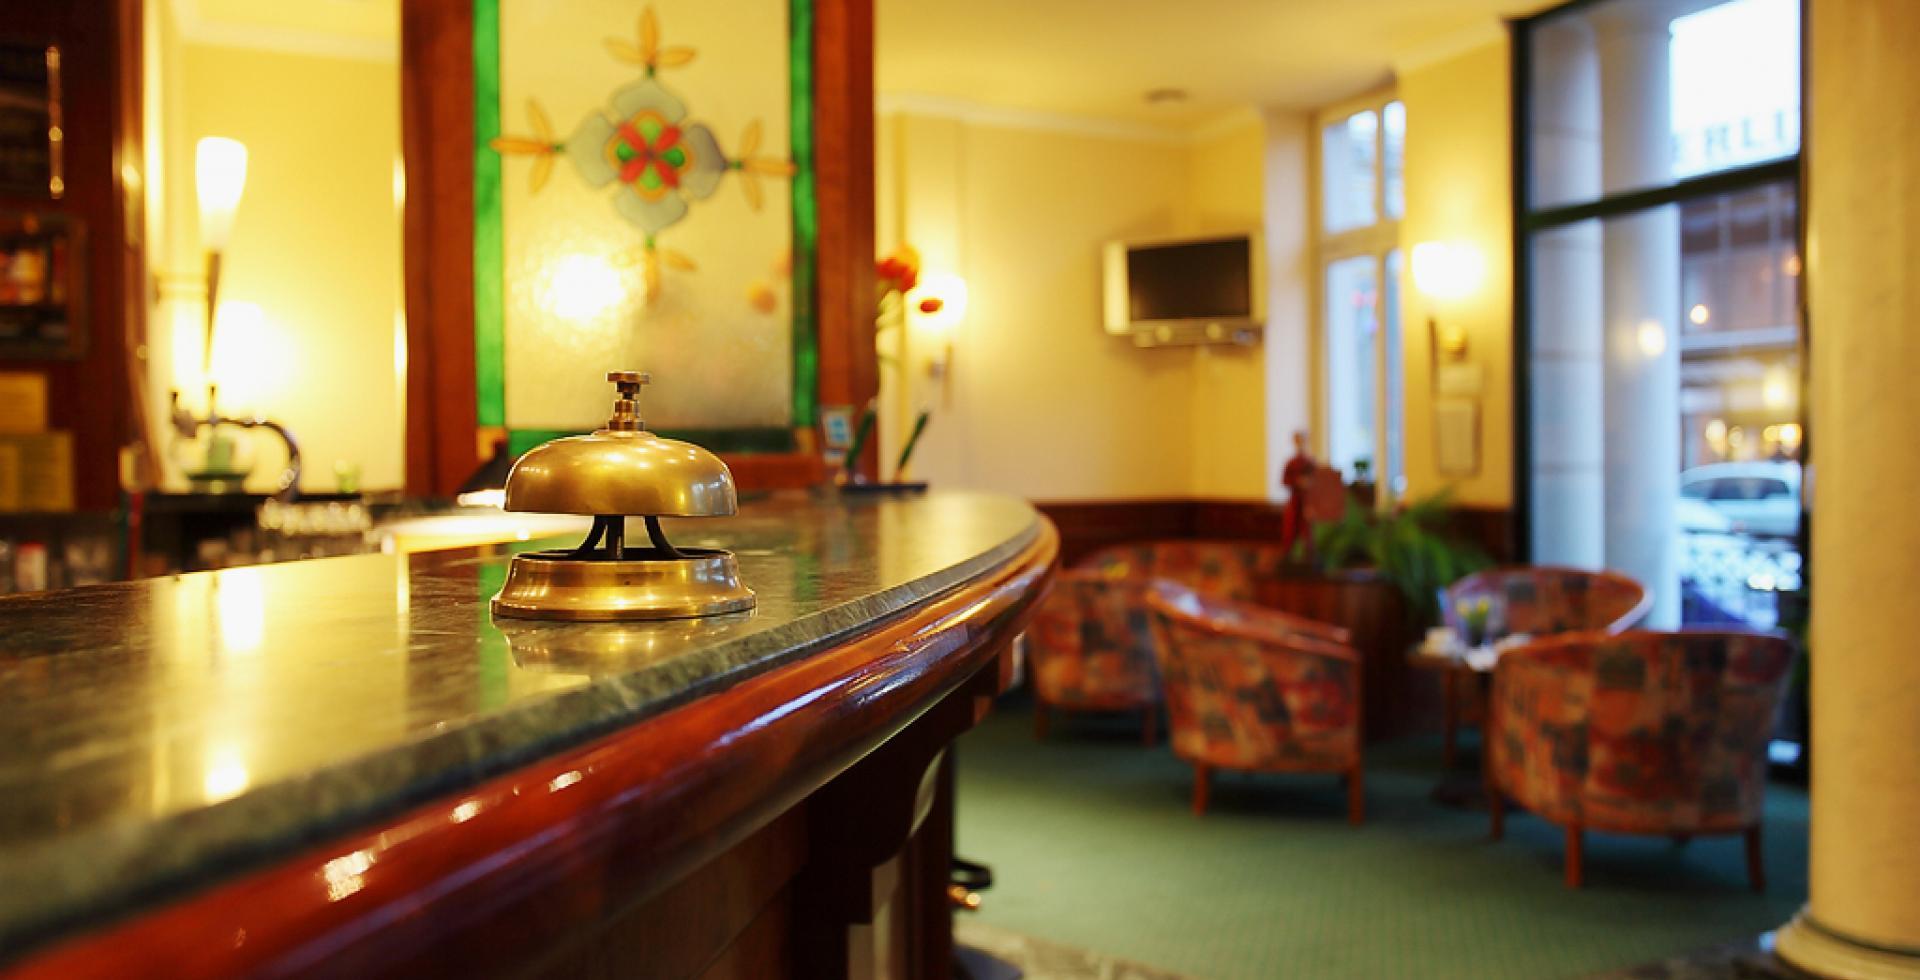 hotel nova berlin lichtenberg hotel n he alexanderplatz. Black Bedroom Furniture Sets. Home Design Ideas